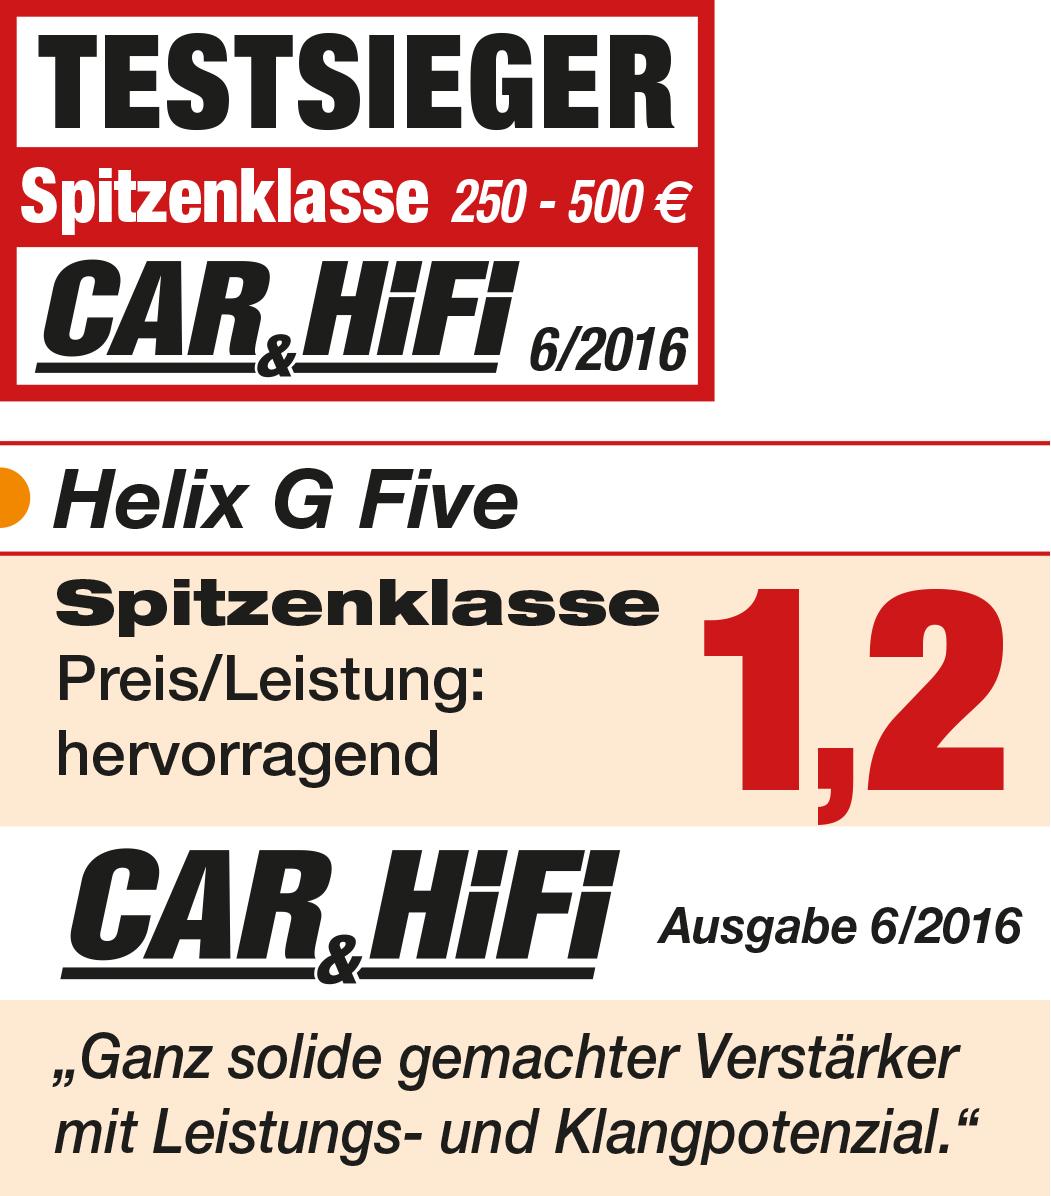 2016-06-Car-Hifi-Bewertung-HELIX-G-FIVE